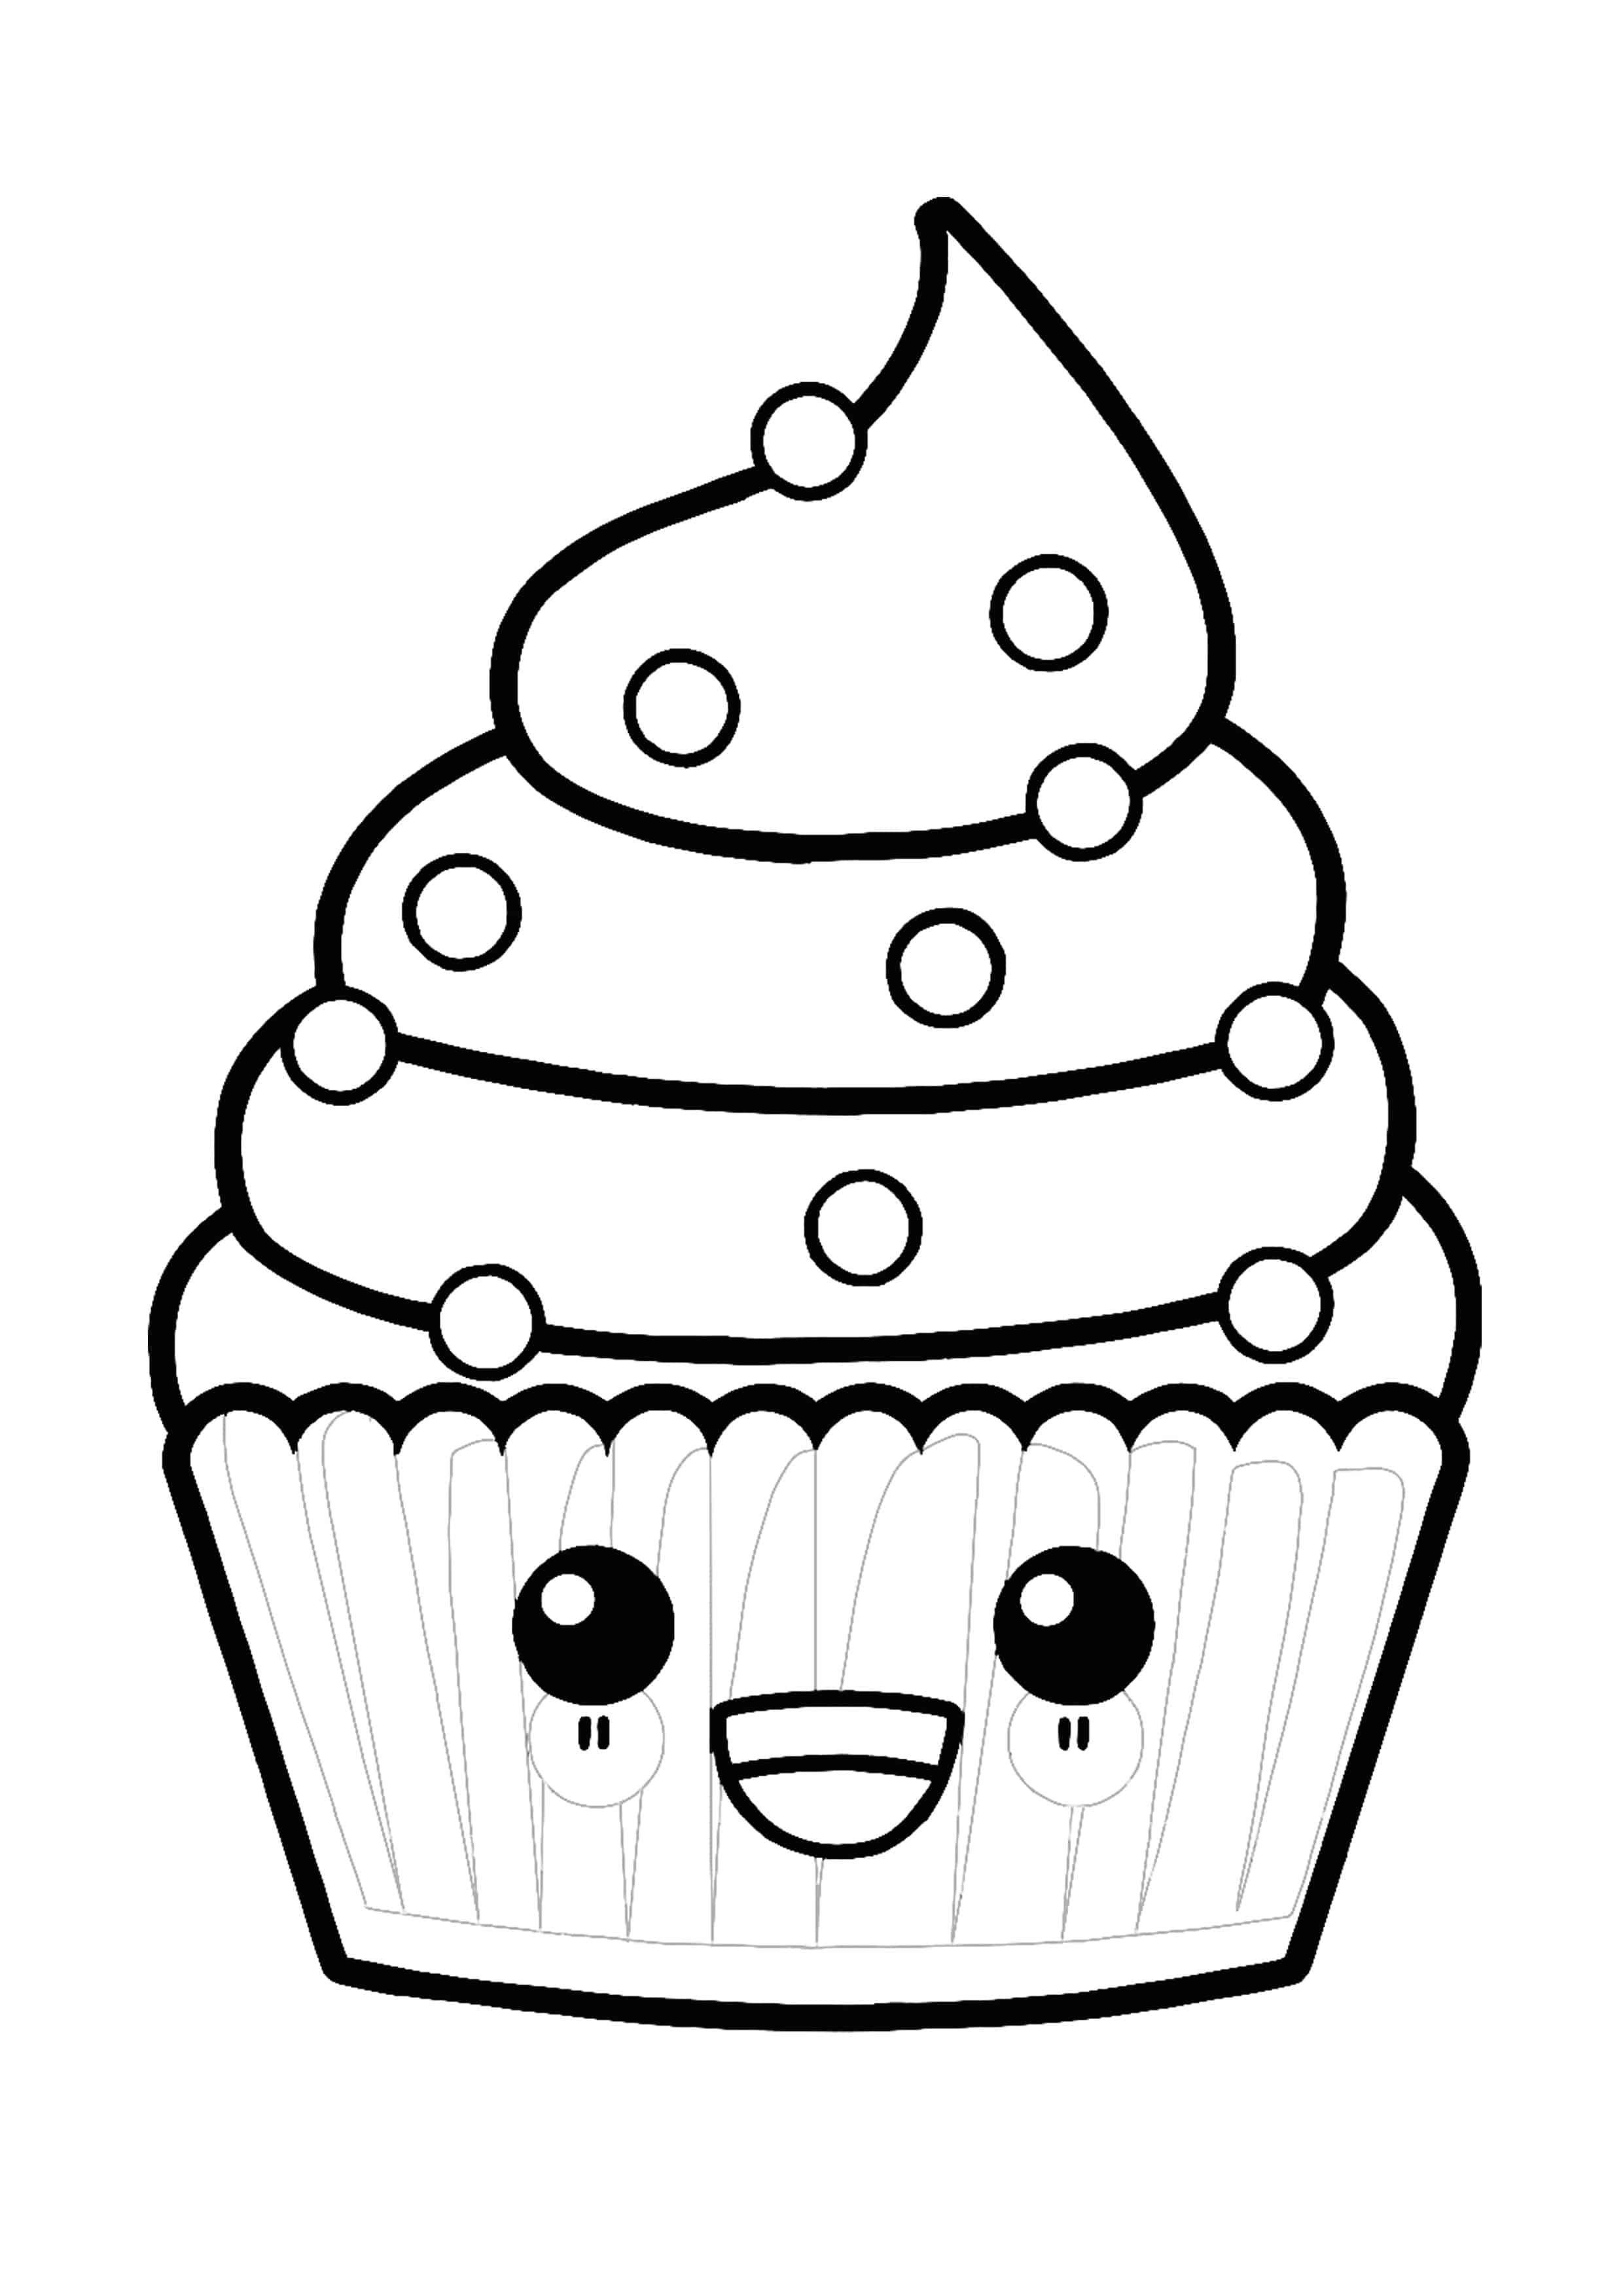 Kawaii Delicious Cupcake Coloring Page Cupcake Coloring Pages Kids Printable Coloring Pages Coloring Stickers